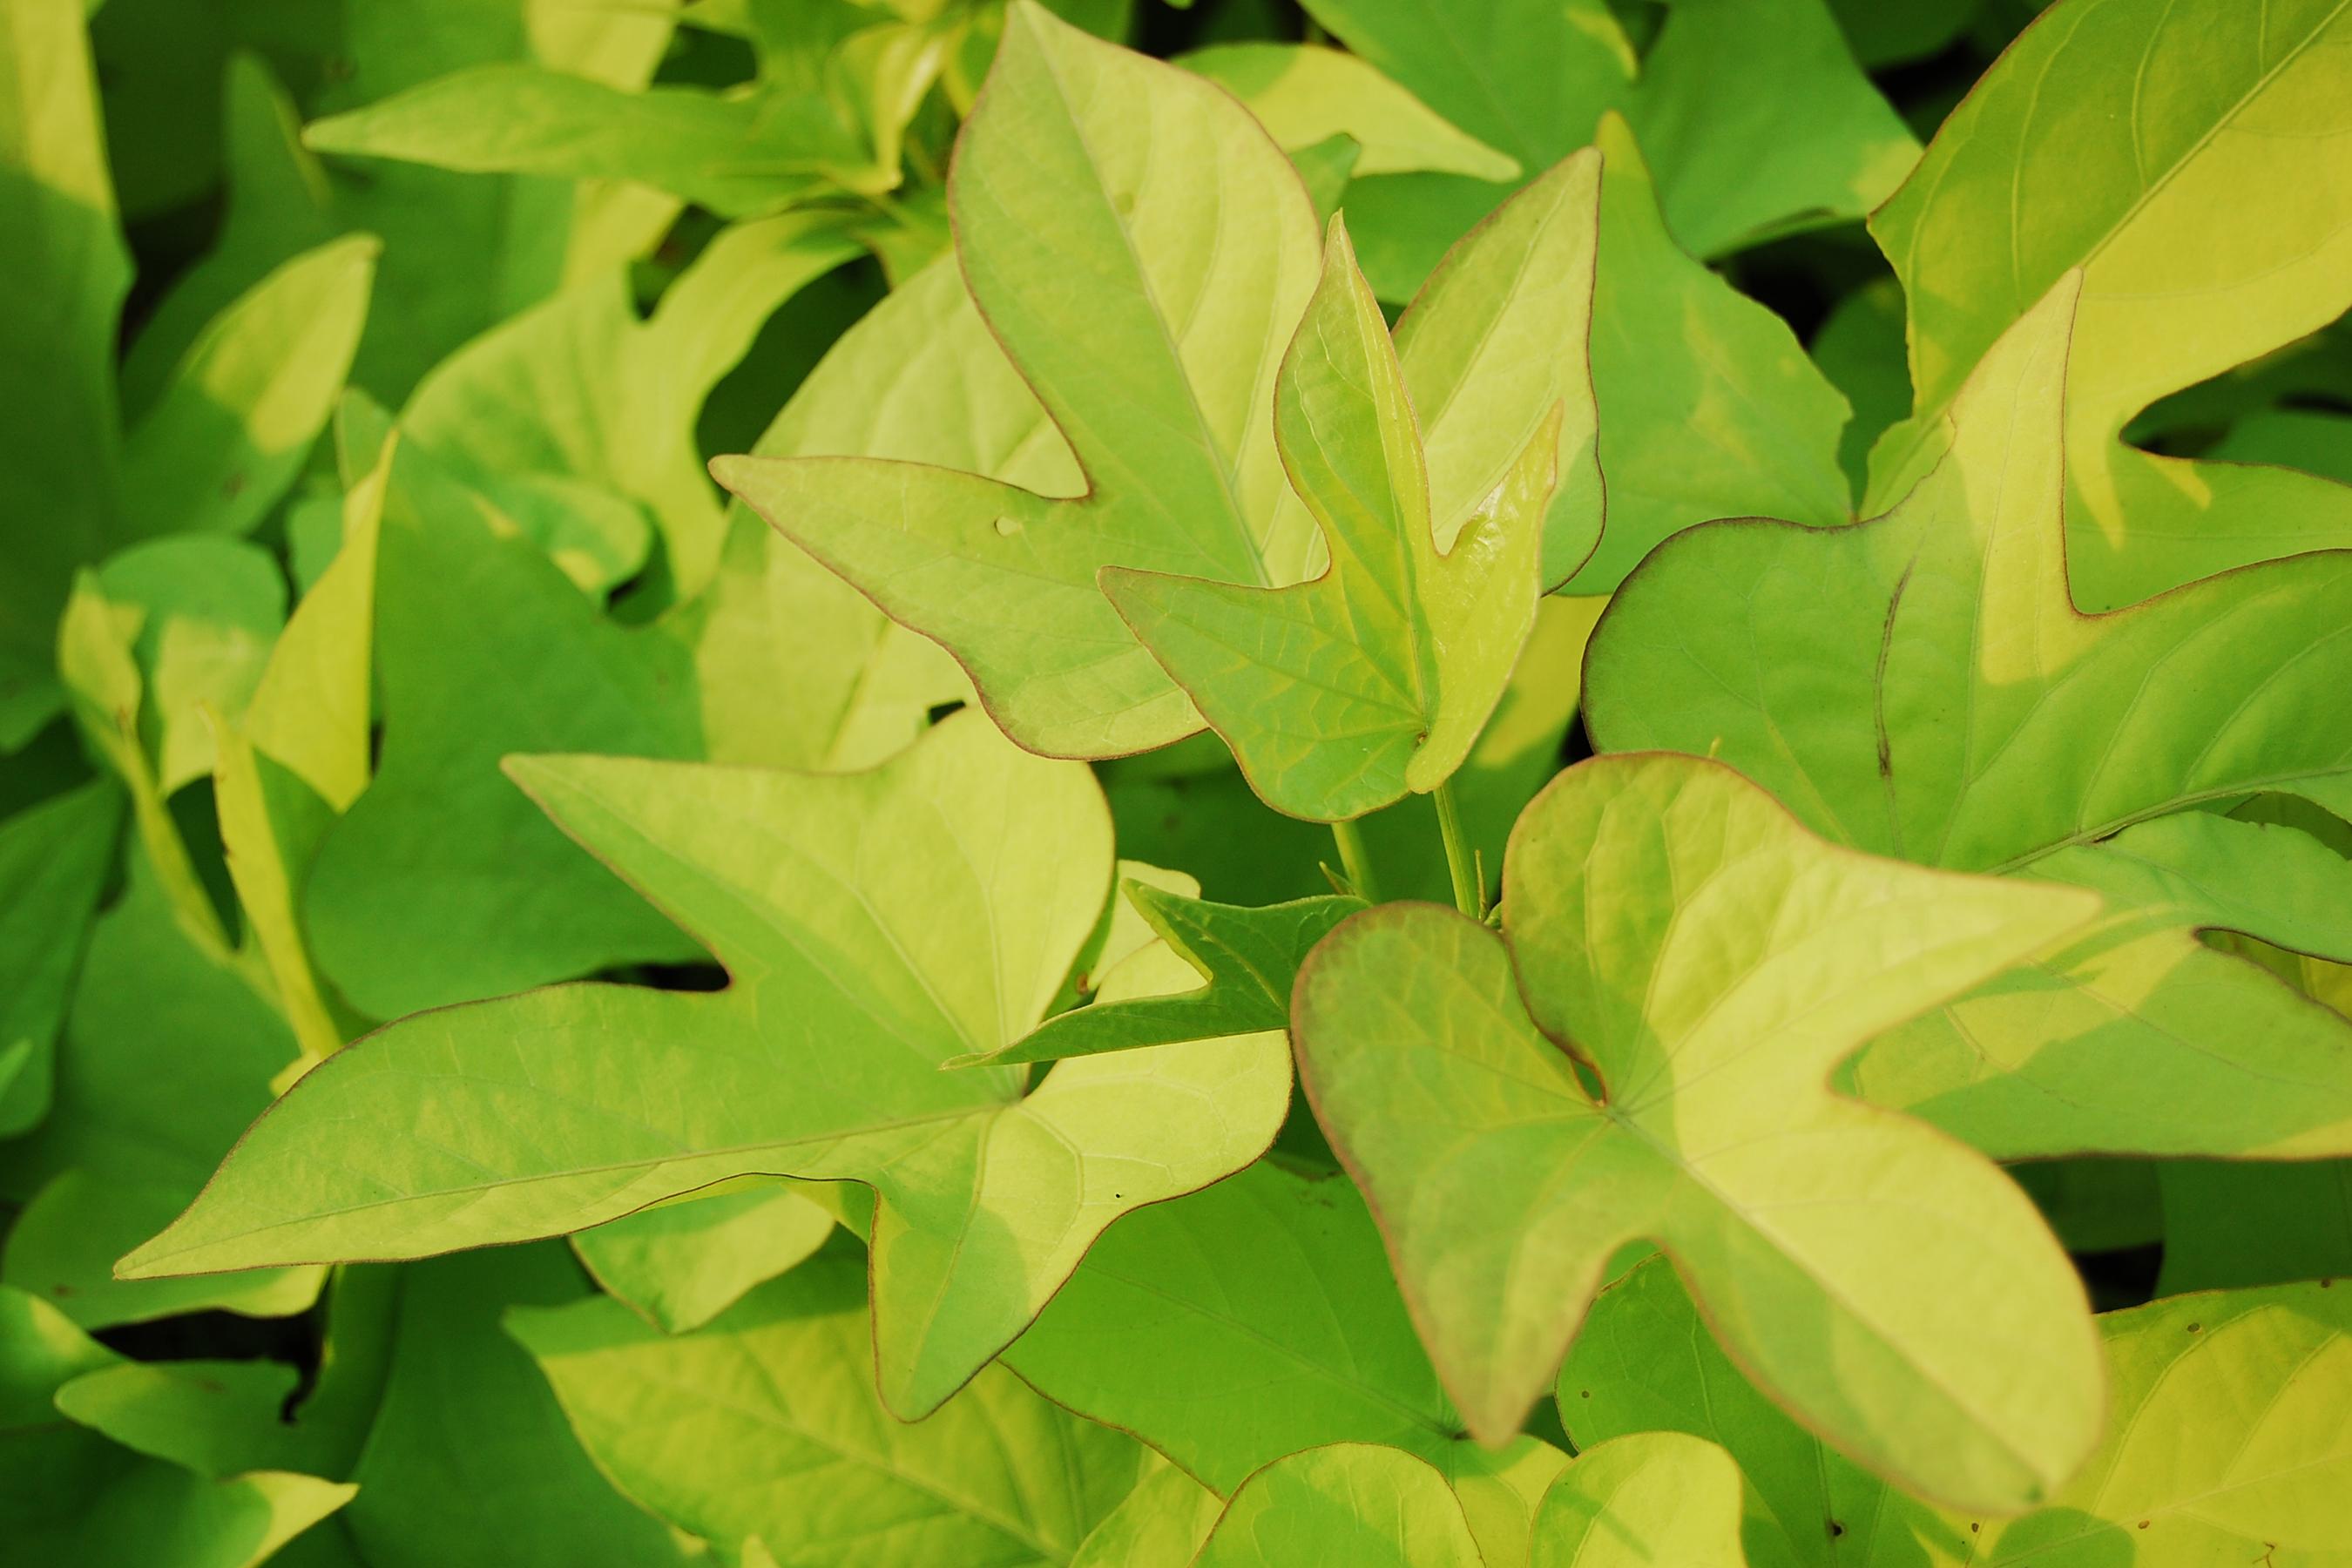 Description Ipomoea batatas from Taman Mini Indonesia Indah.jpg